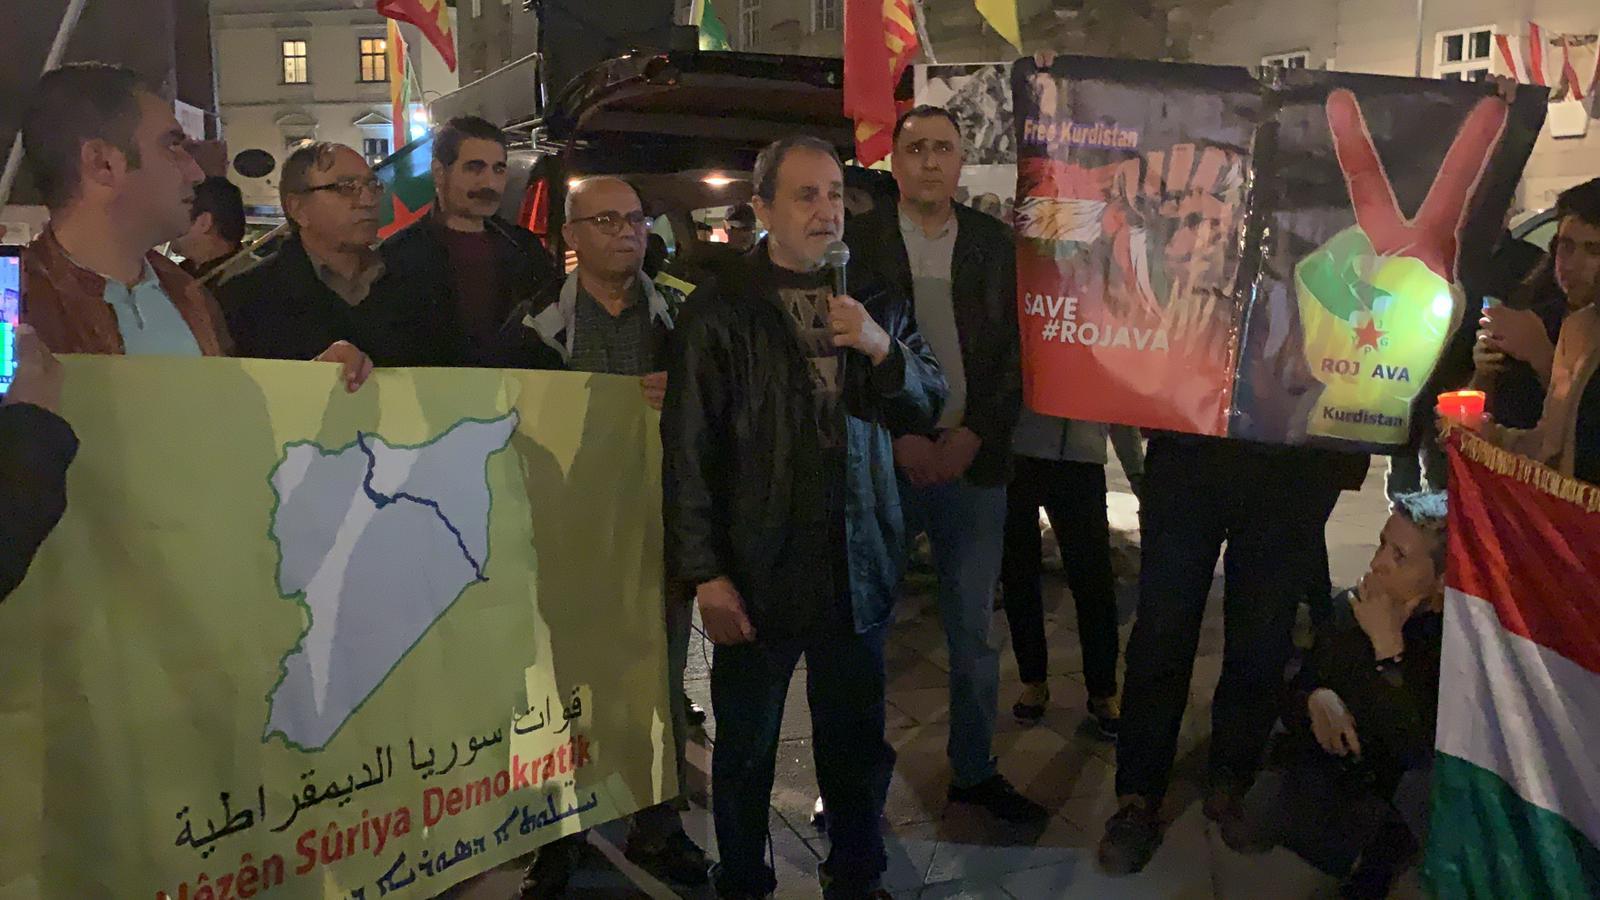 Photo of استمرار الاعتصامات والمظاهرات في فينا النمساوية تنديداً بالغزو التركي